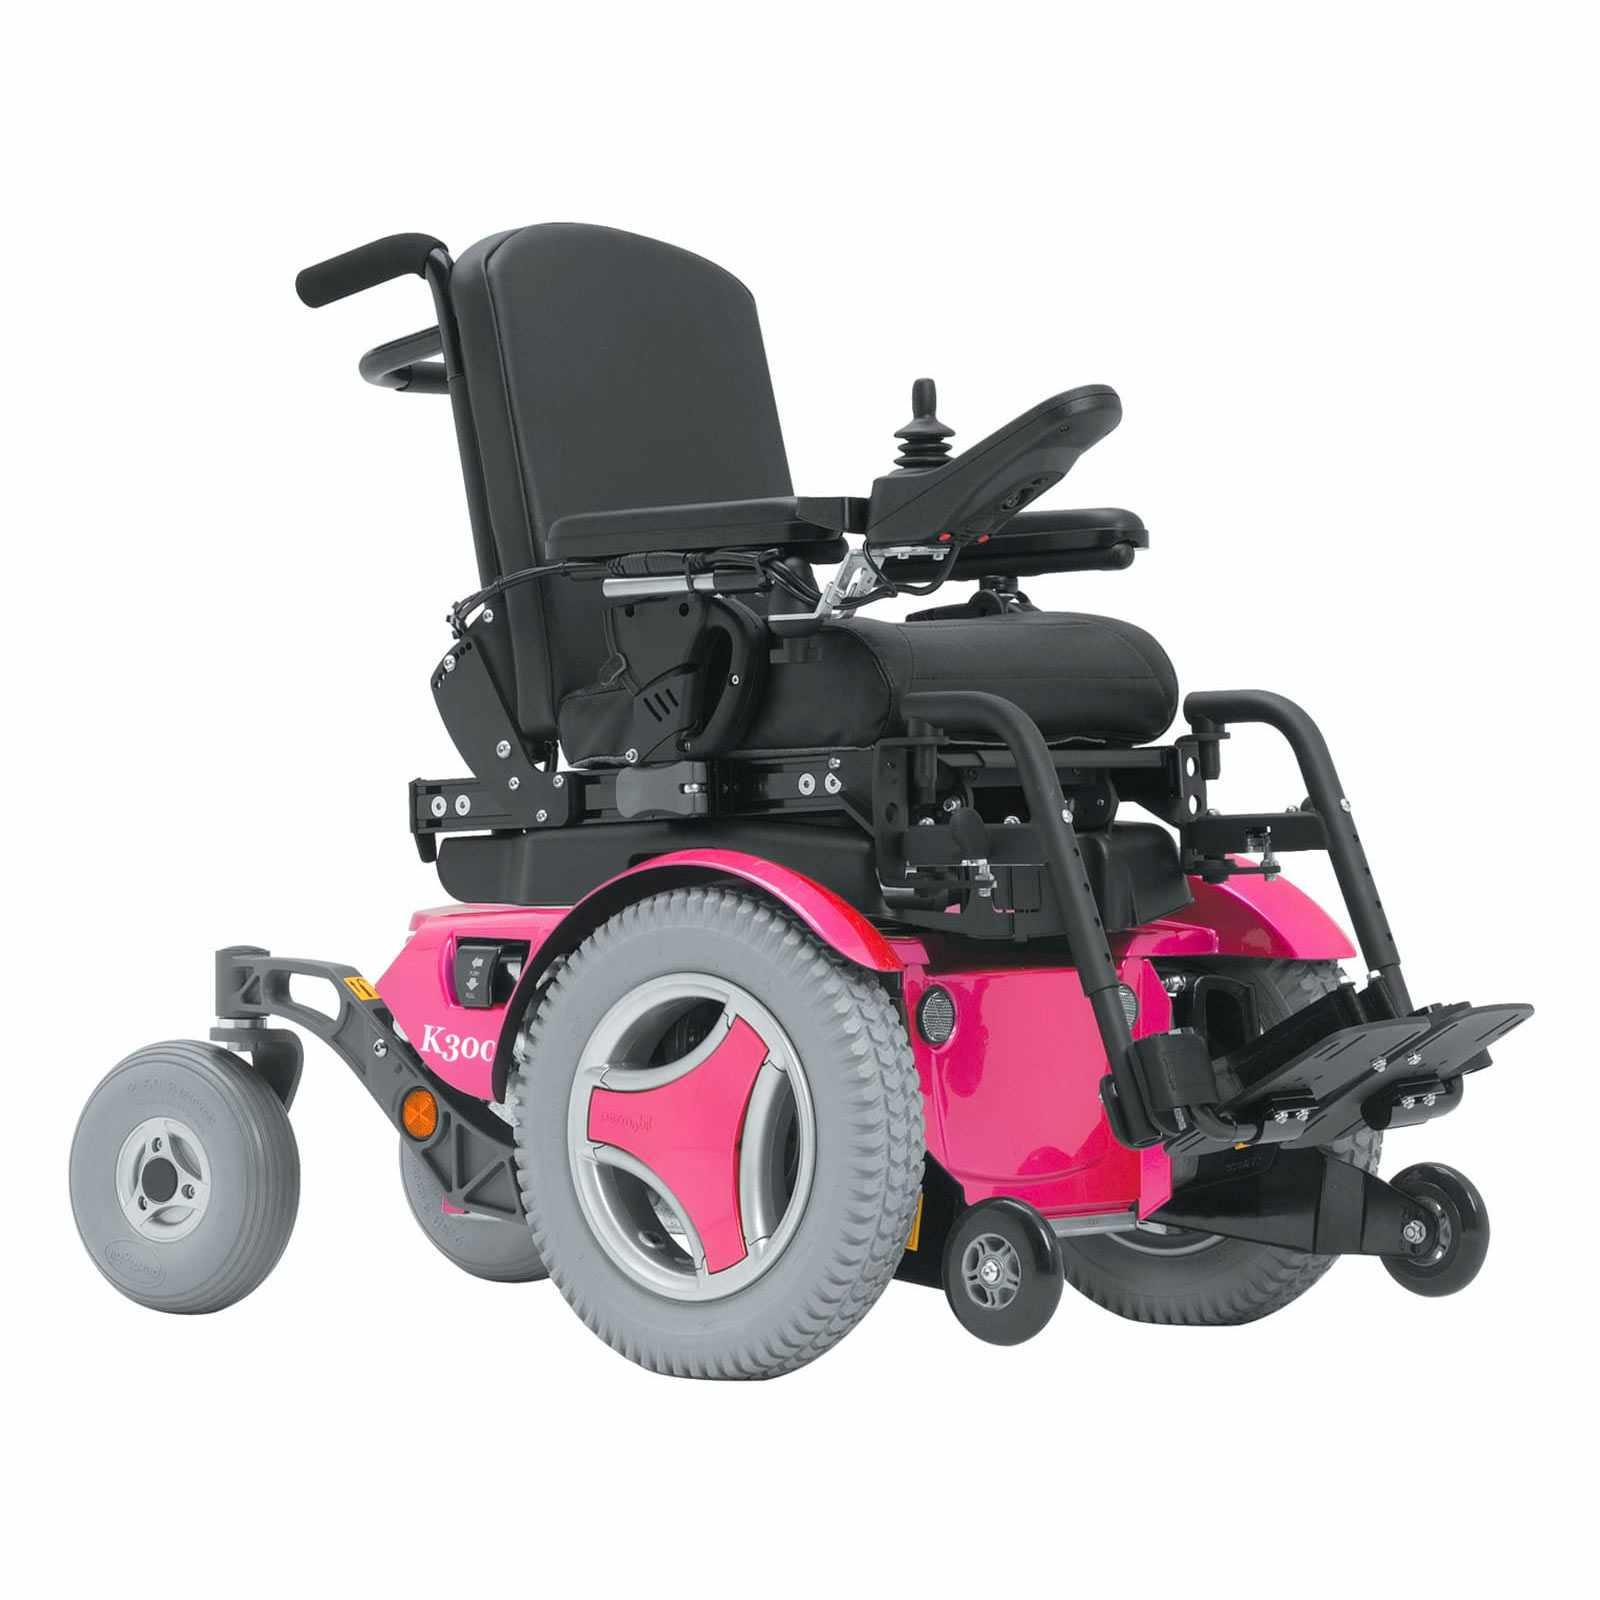 Permobil K300 PS Junior Power Wheelchair | Medicaleshop